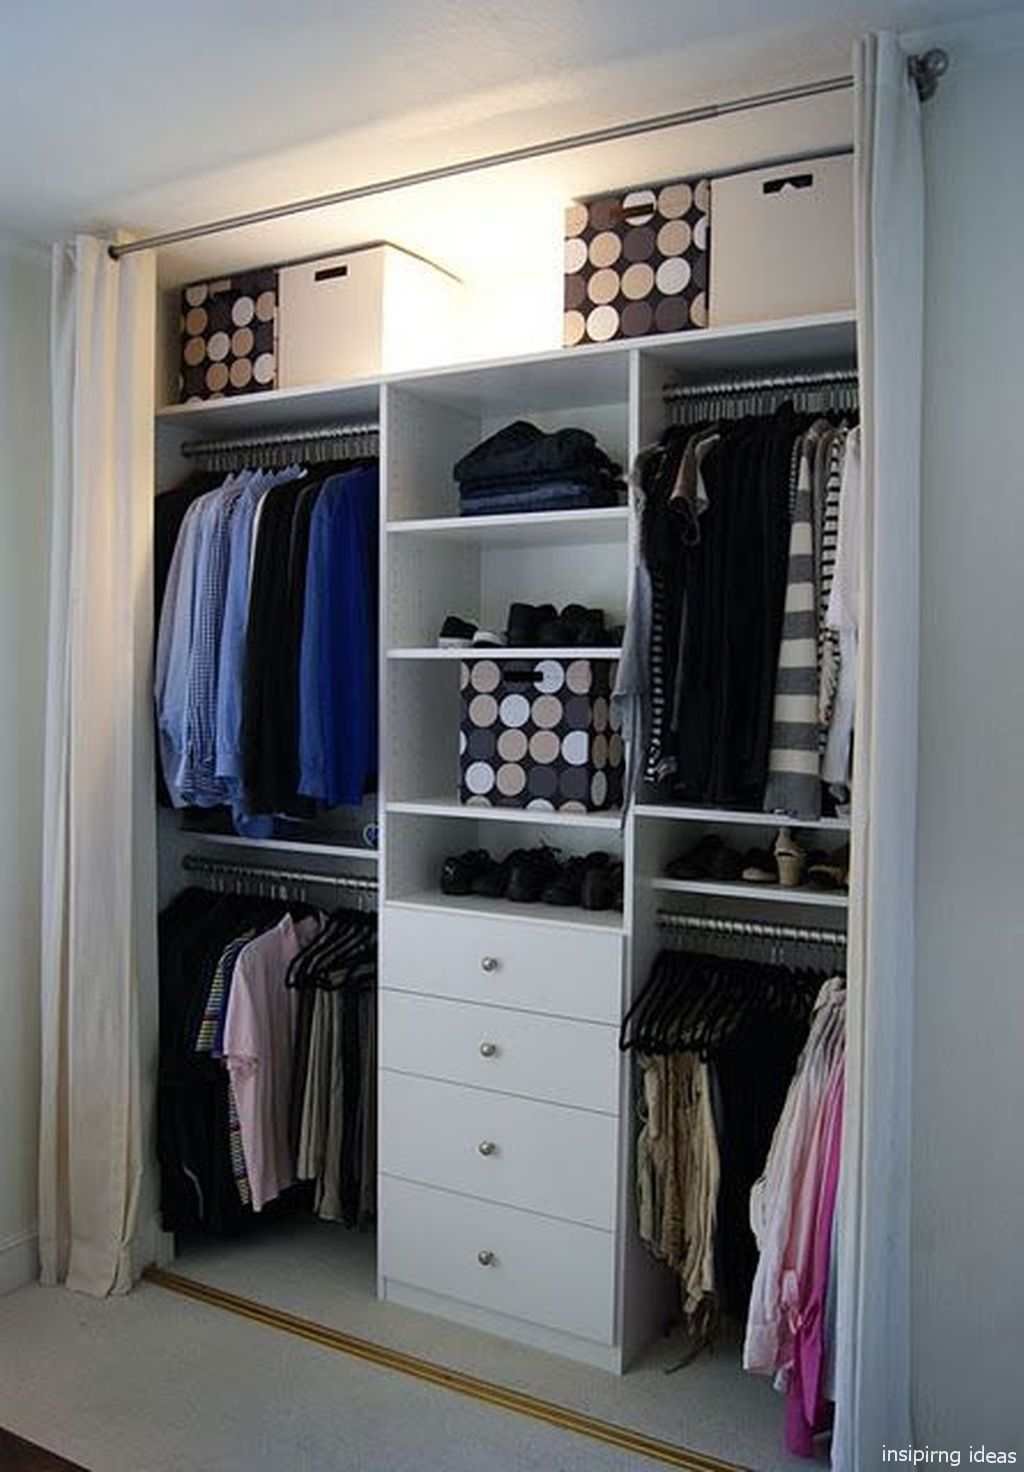 44 Genius Small Closet Ideas With Images Bedroom Organization